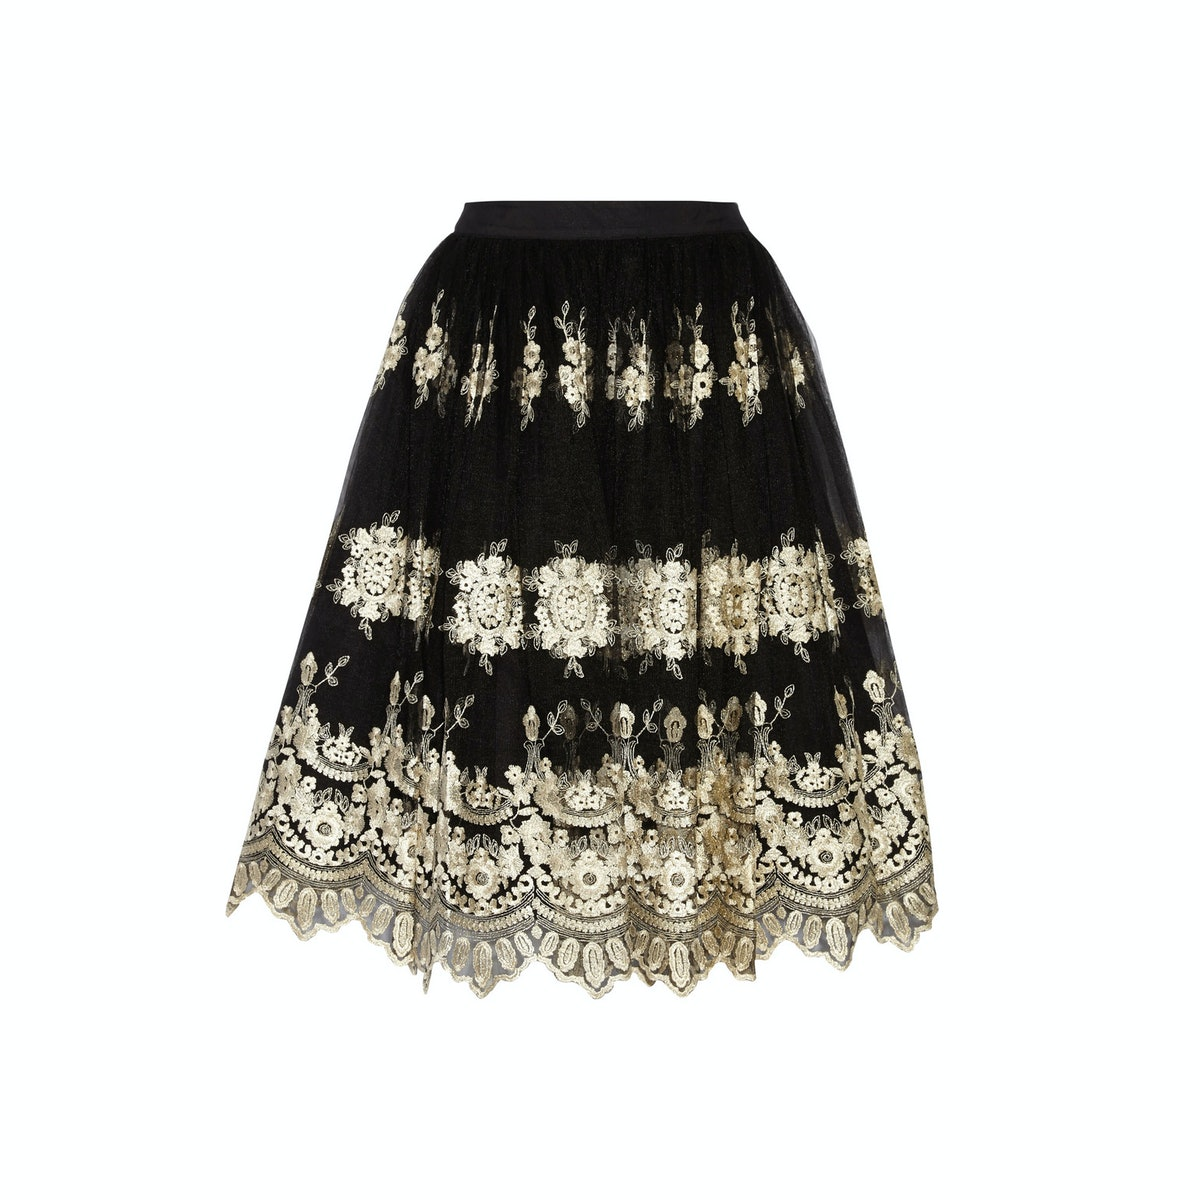 Alice & Olivia skirt, $550, netaporter.com.